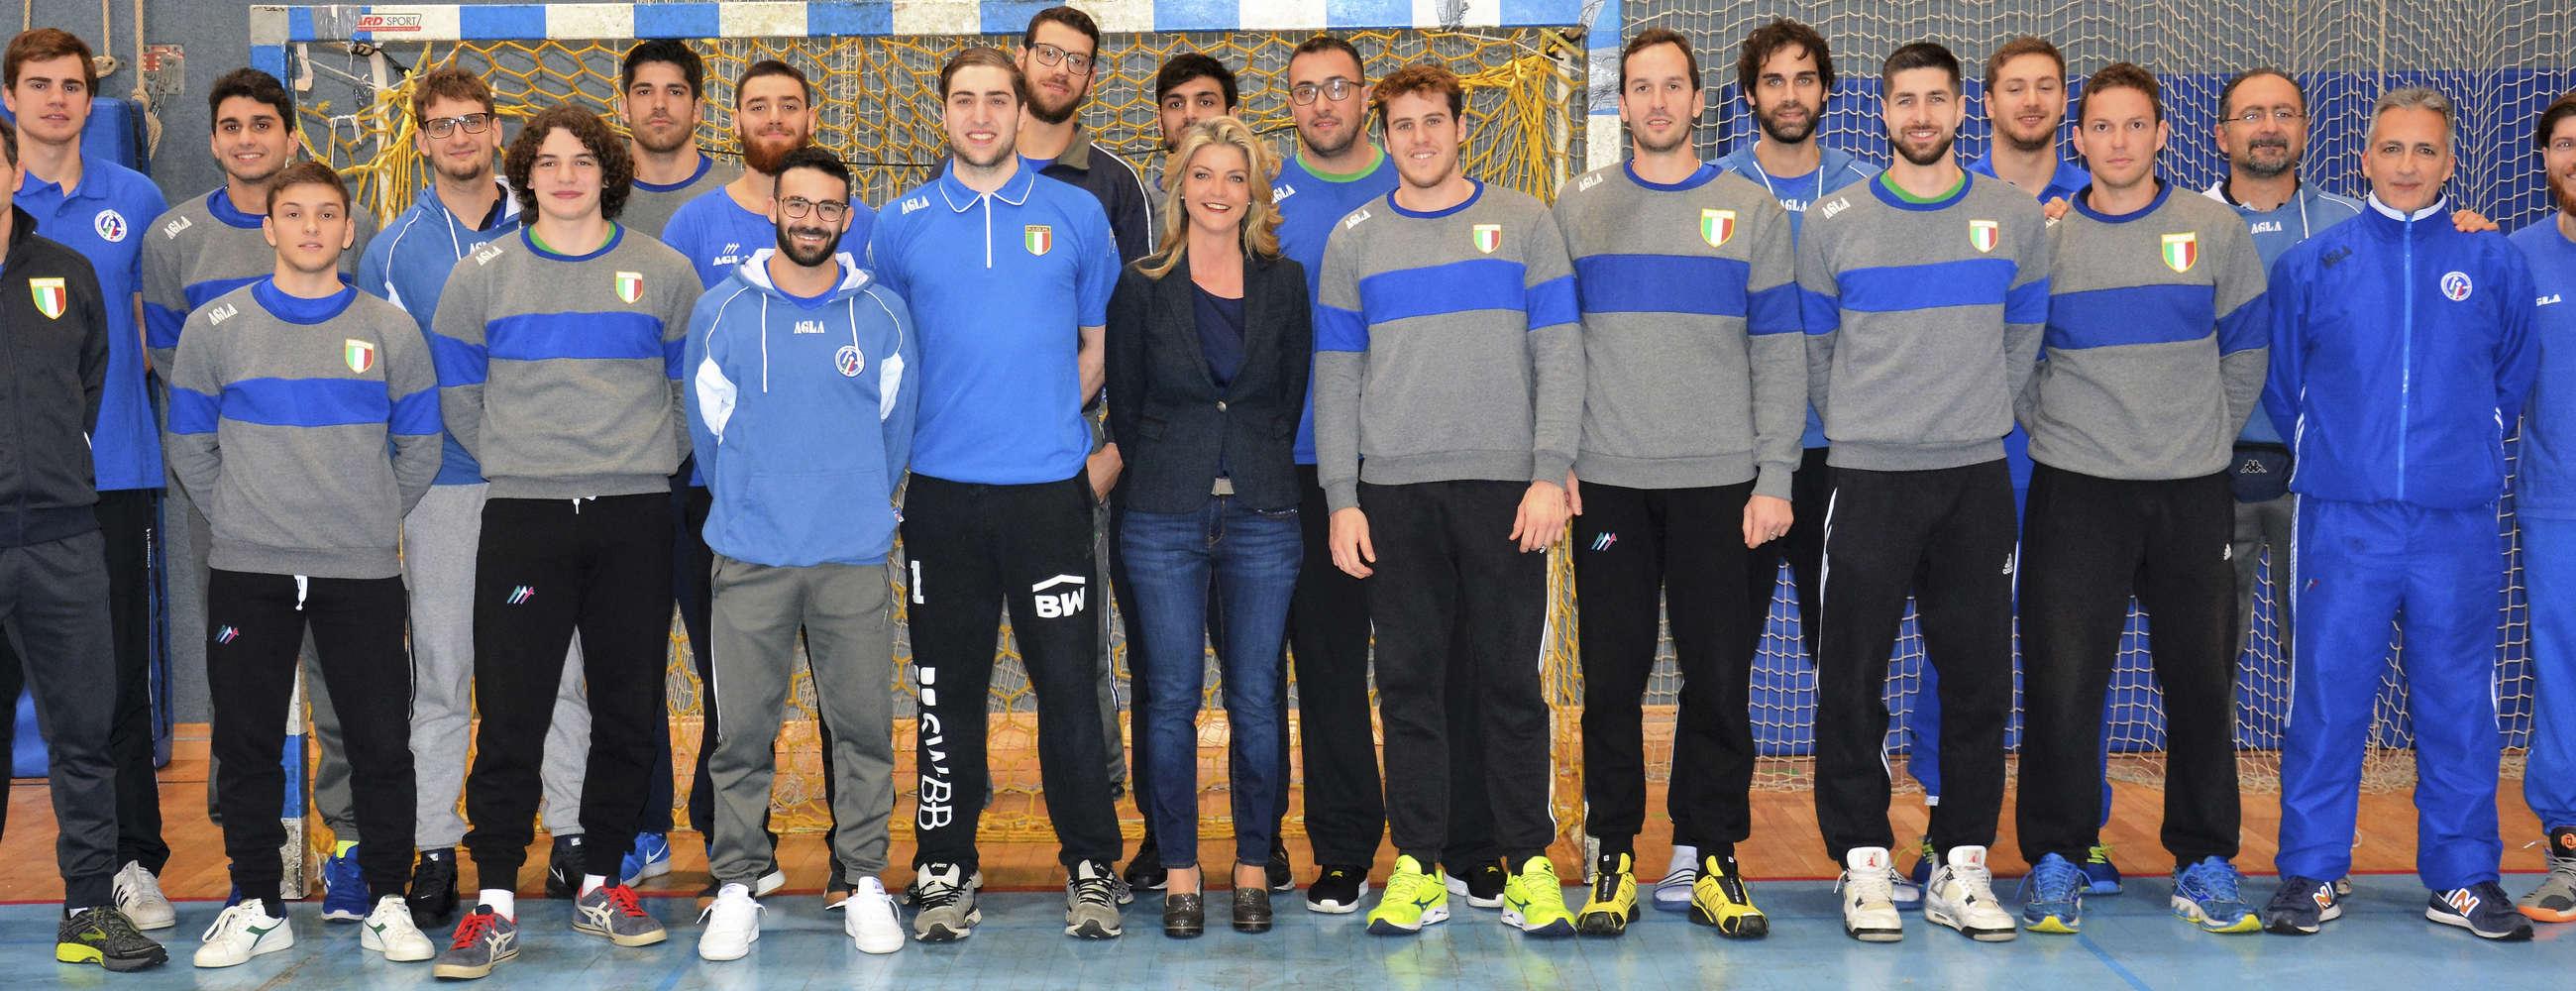 italienische nationalmannschaft 2019